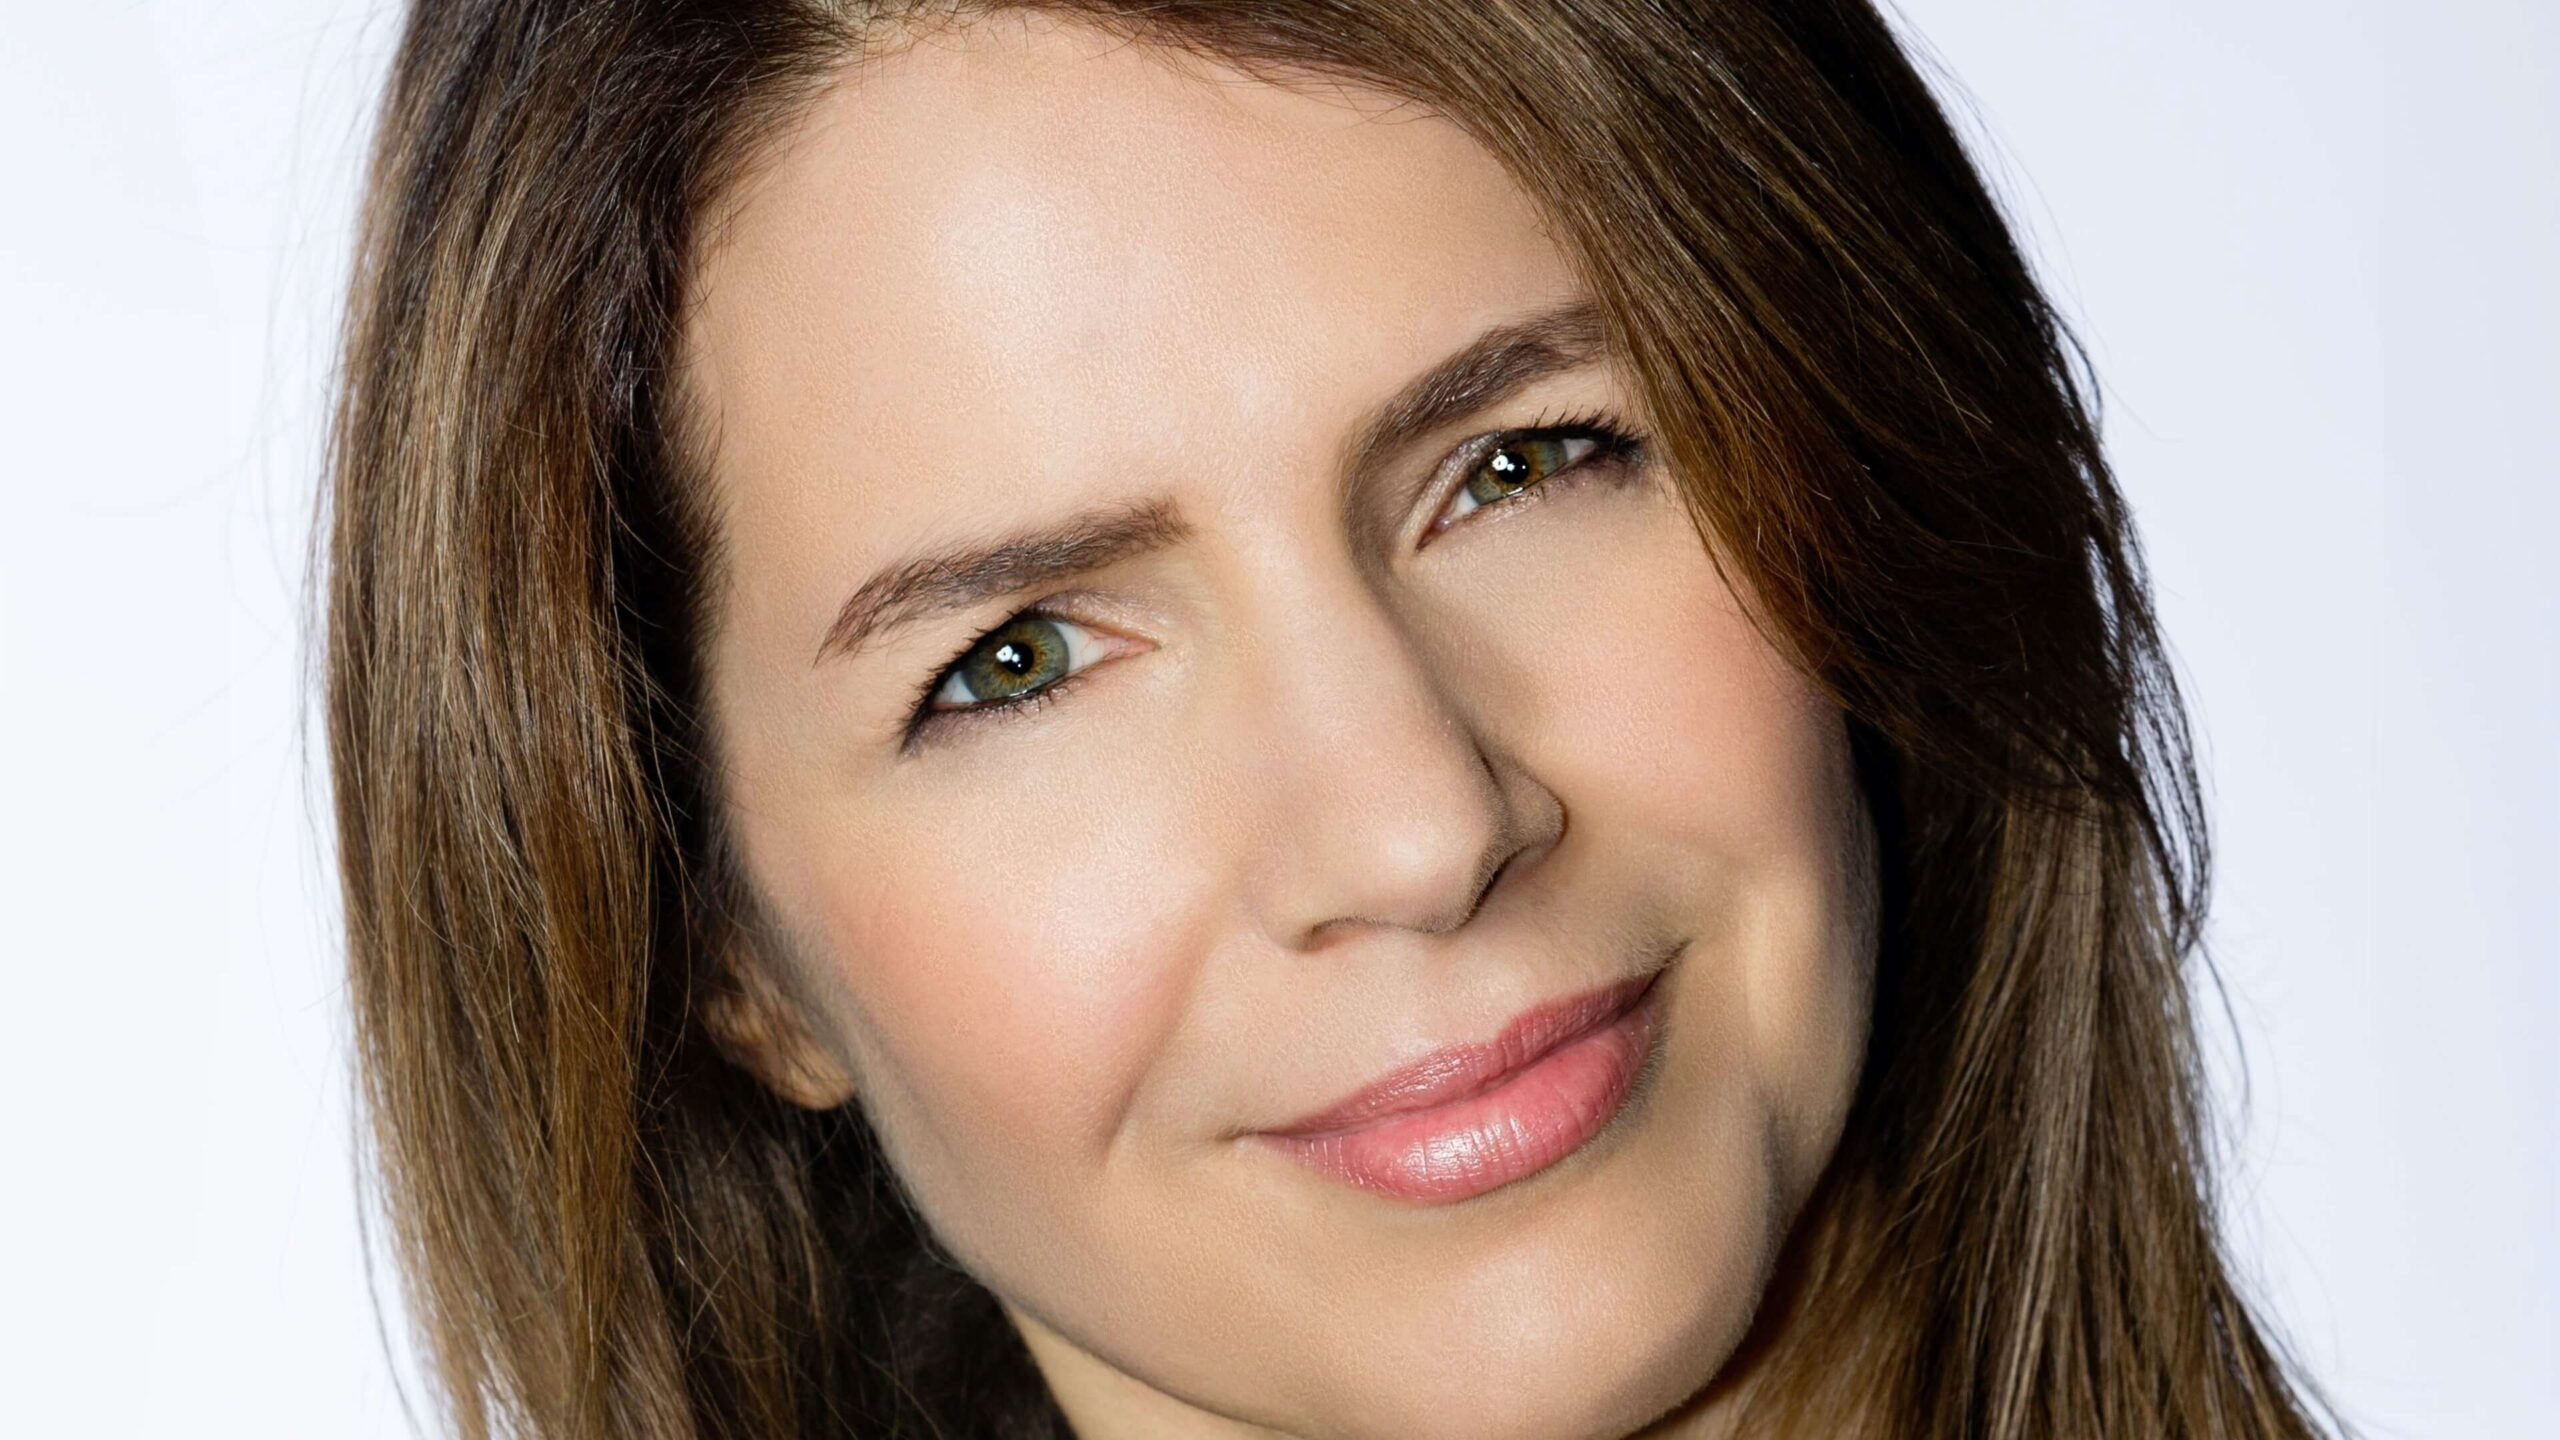 Jill Offman, Torresblanco develop drama on life of artist Artemisia Gentileschi.